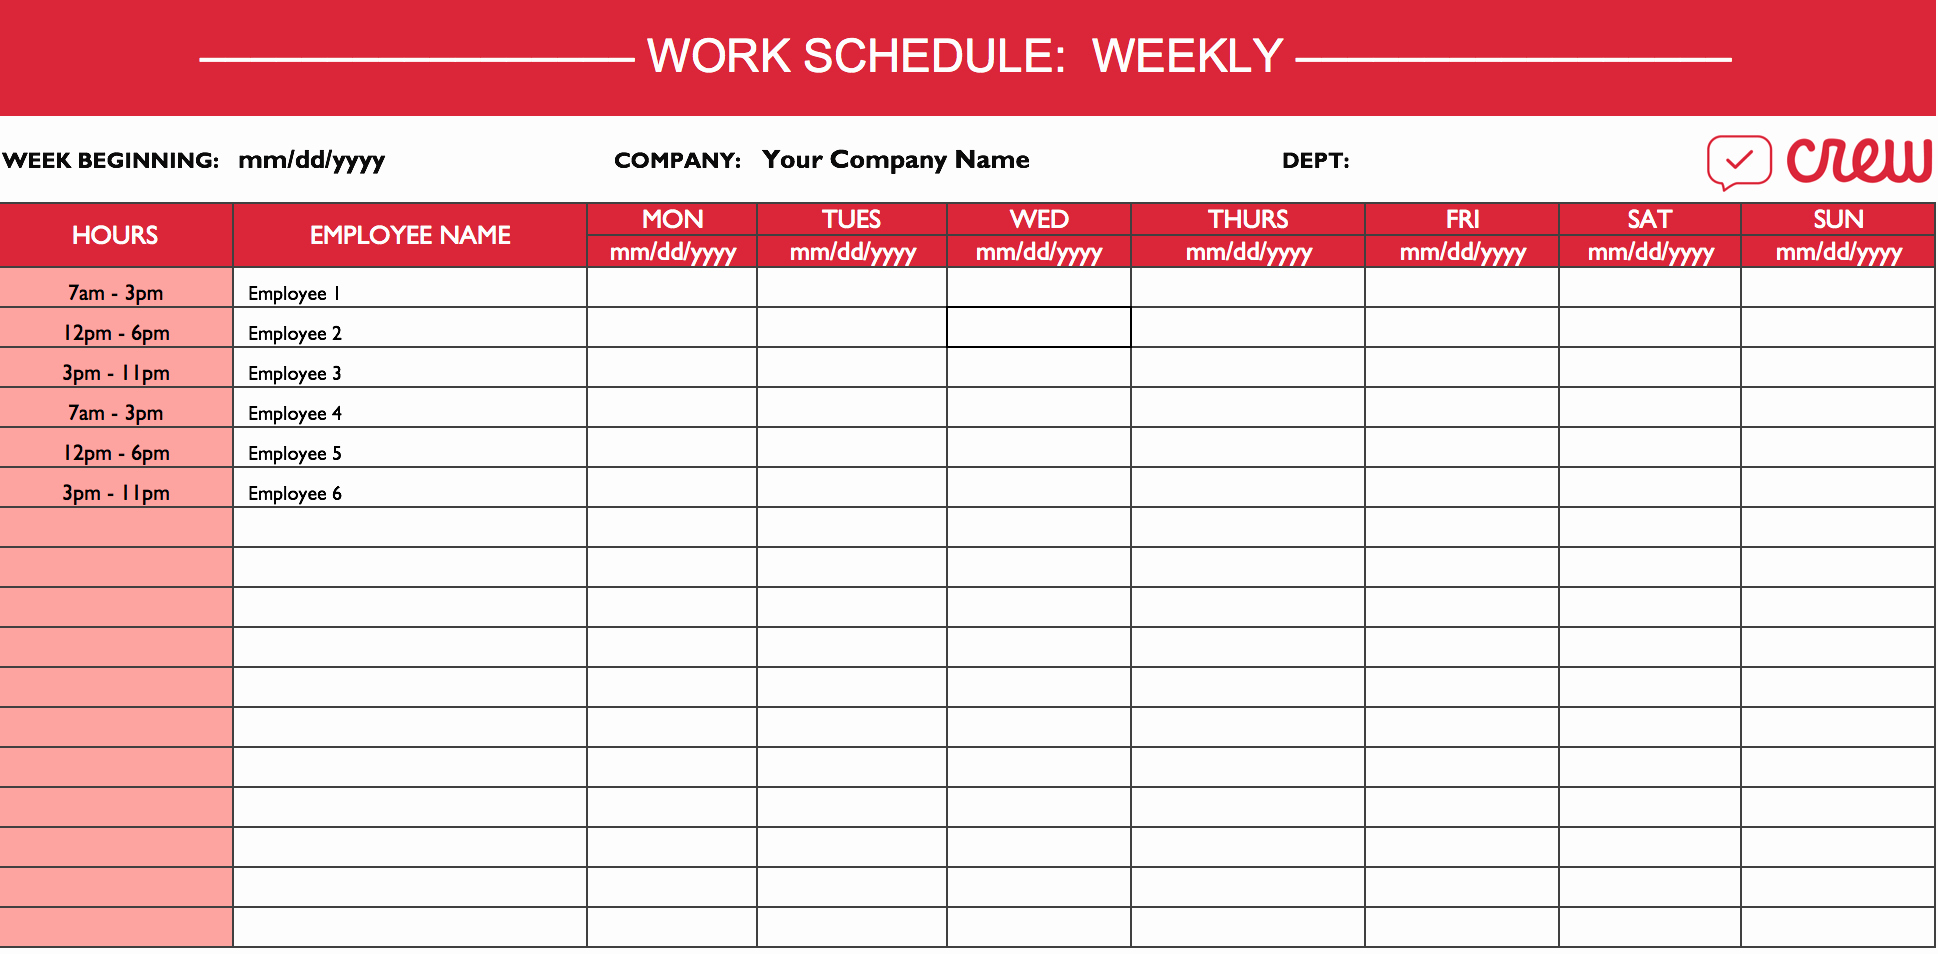 Week Work Schedule Template New Weekly Work Schedule Template I Crew